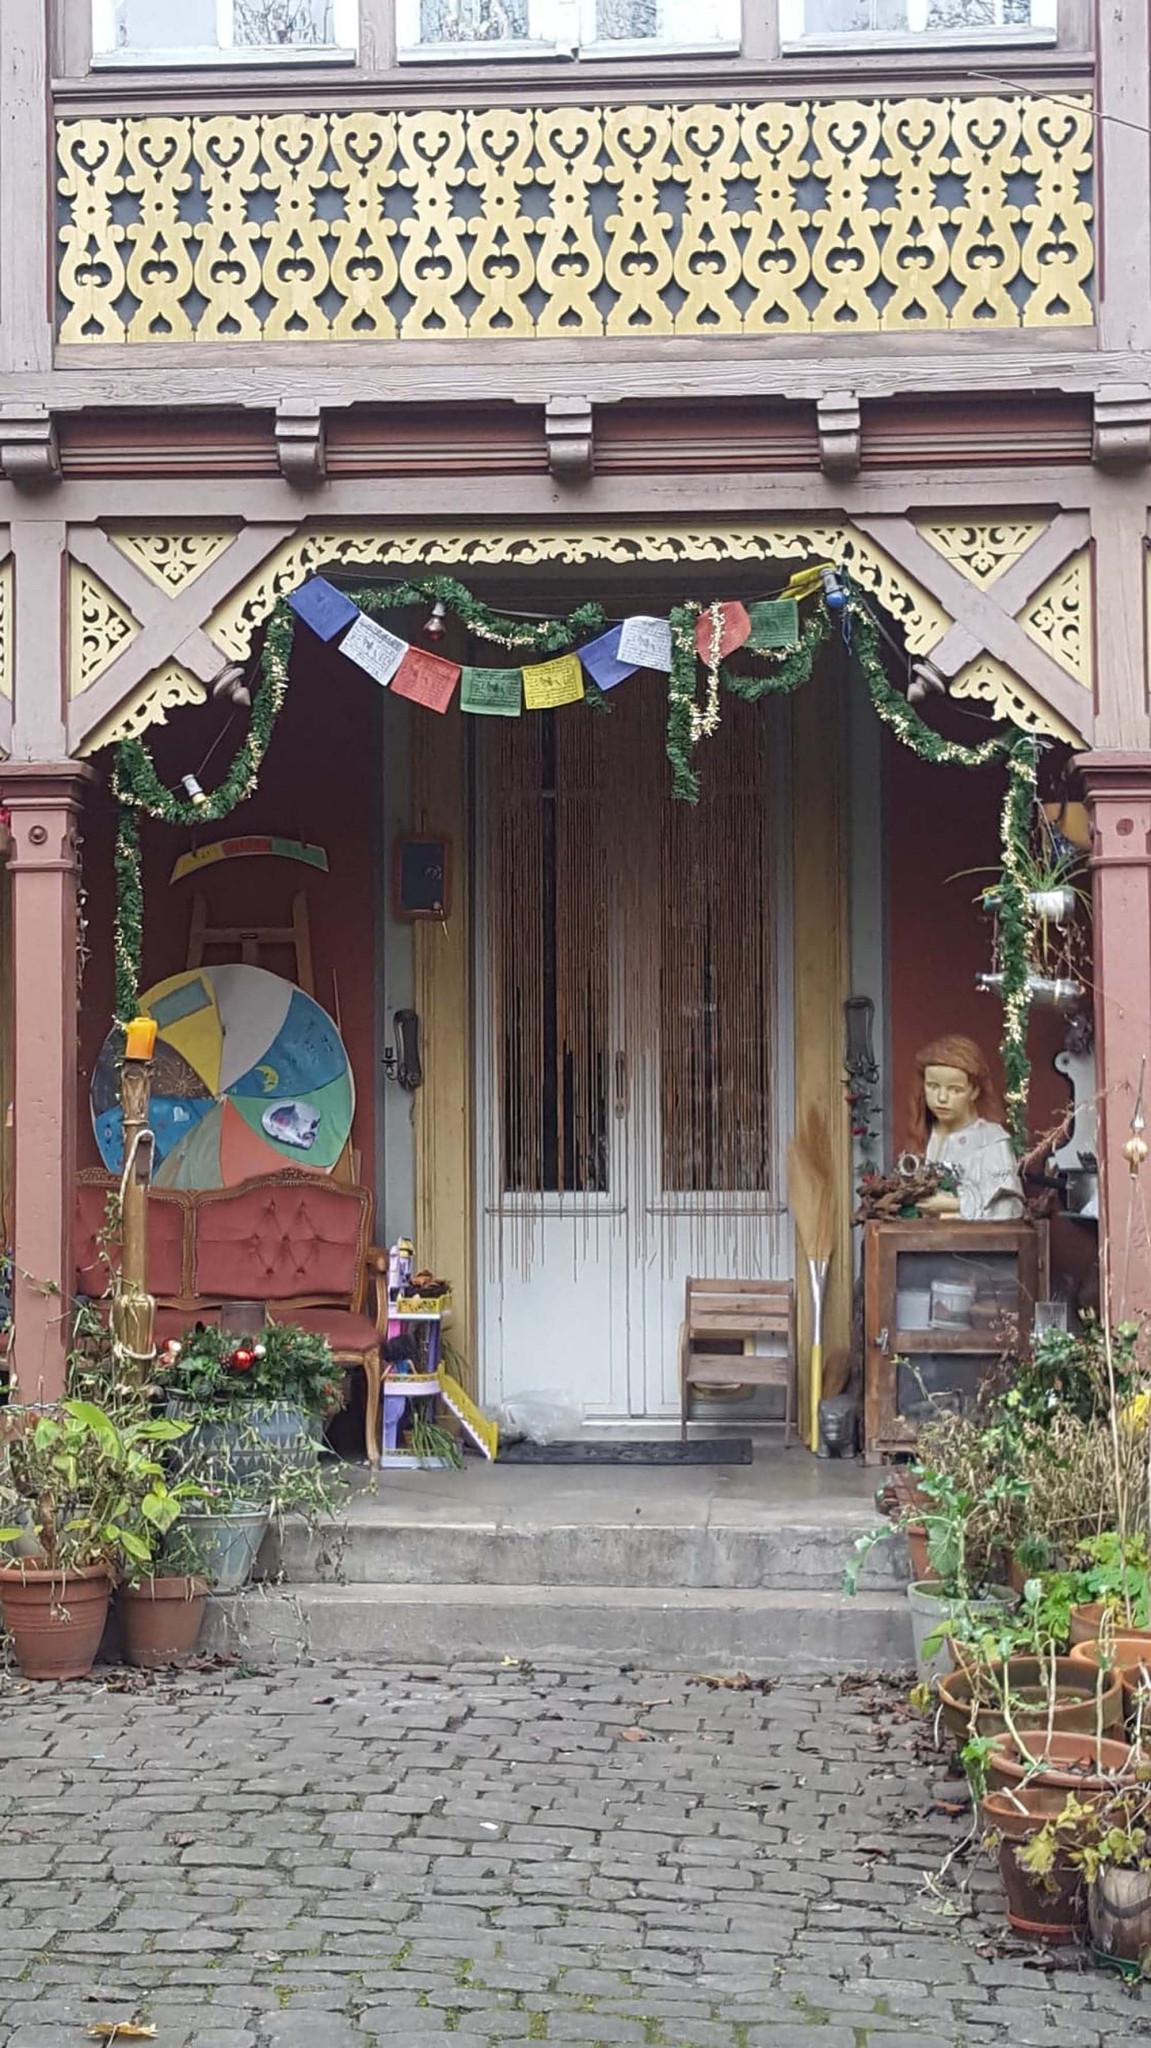 Buddhist prayer flags on a house, Bern, Switzerland